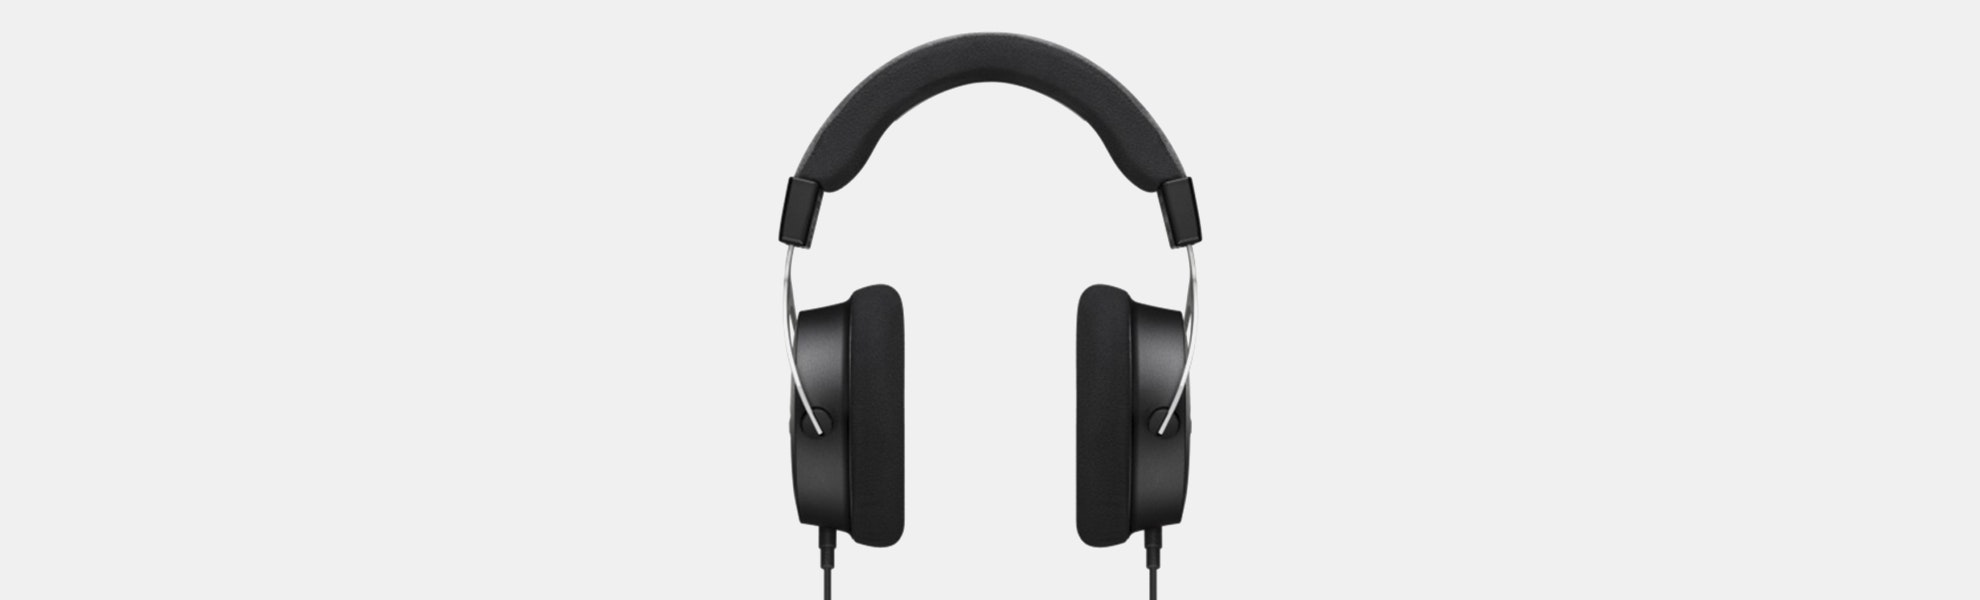 Beyerdynamic Amiron Home Headphones